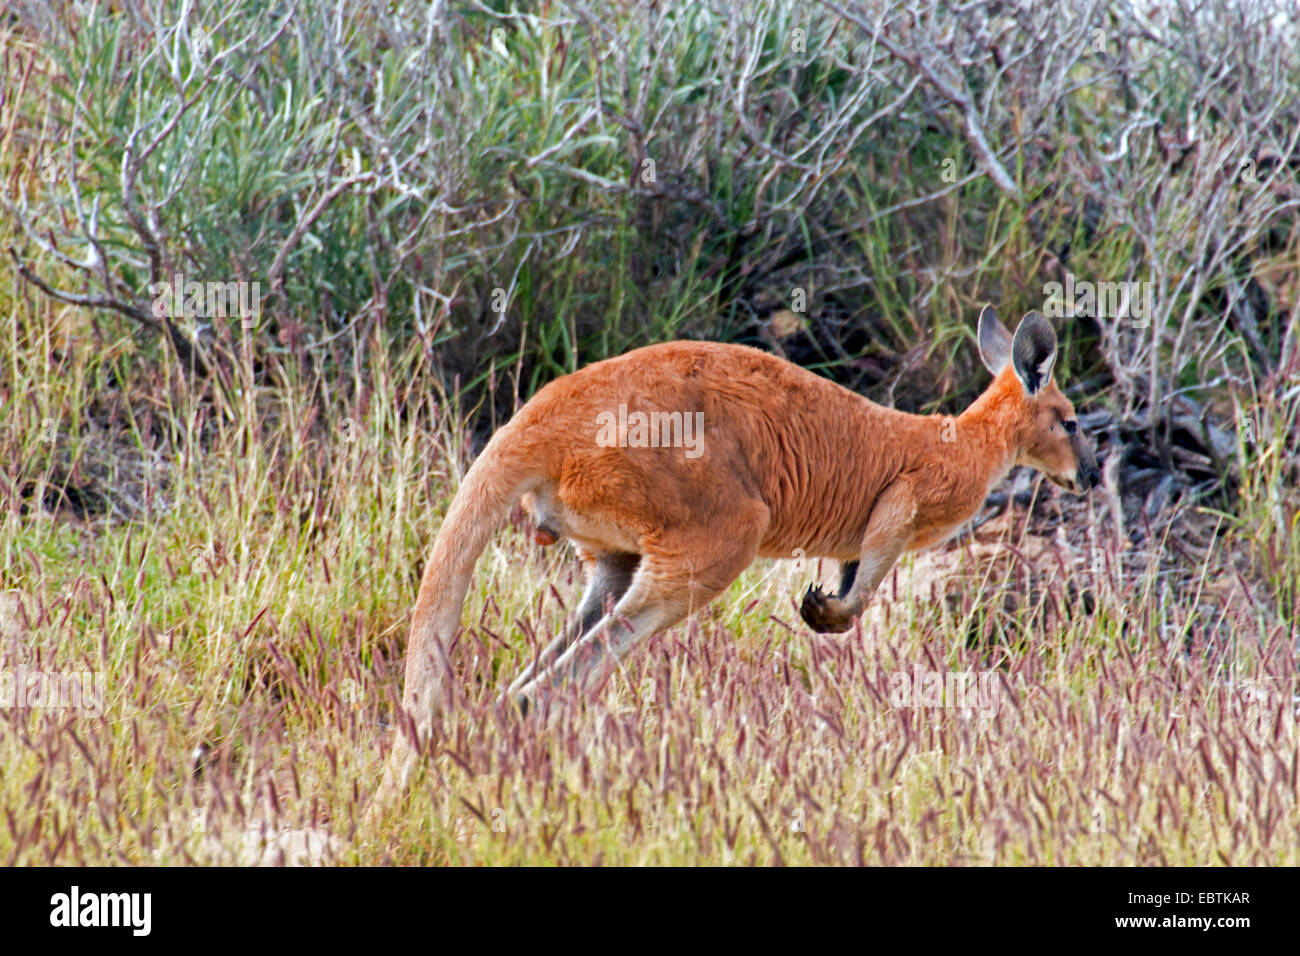 red kangaroo, plains Kangaroo, blue flier (Macropus rufus, Megaleia rufa), jumping in the shrubbery, Australia, - Stock Image